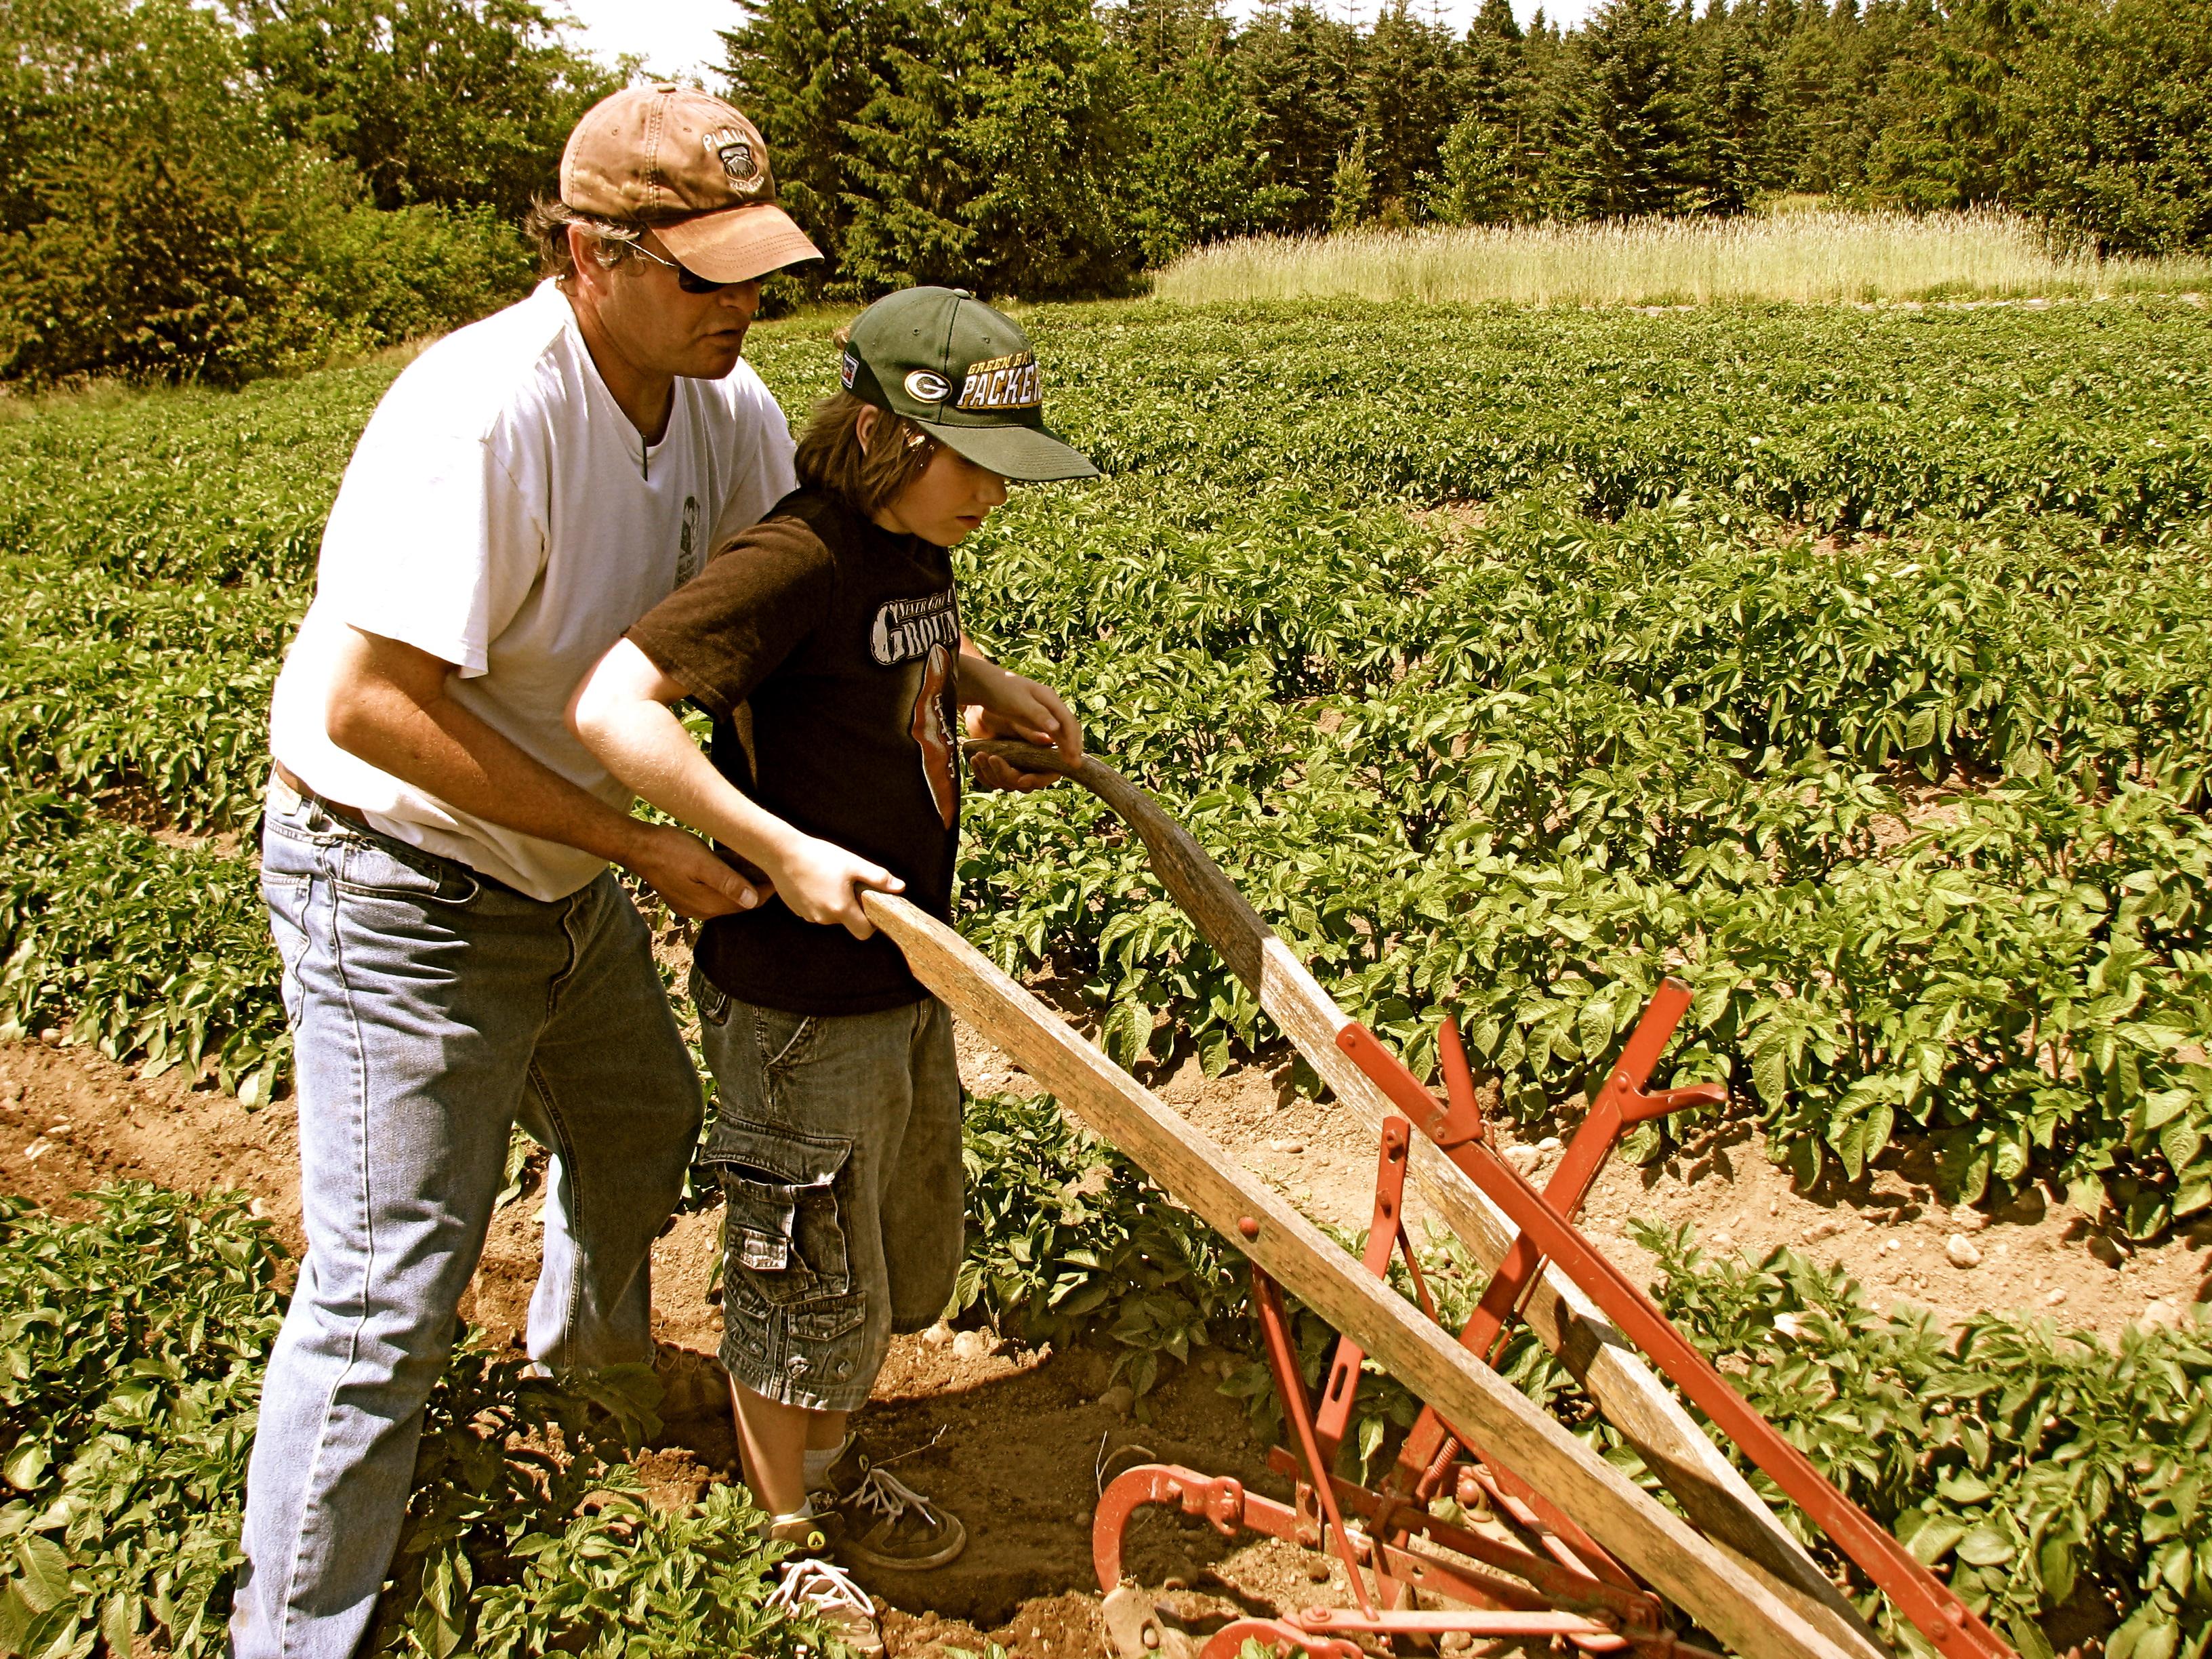 Jon & Student Plowing